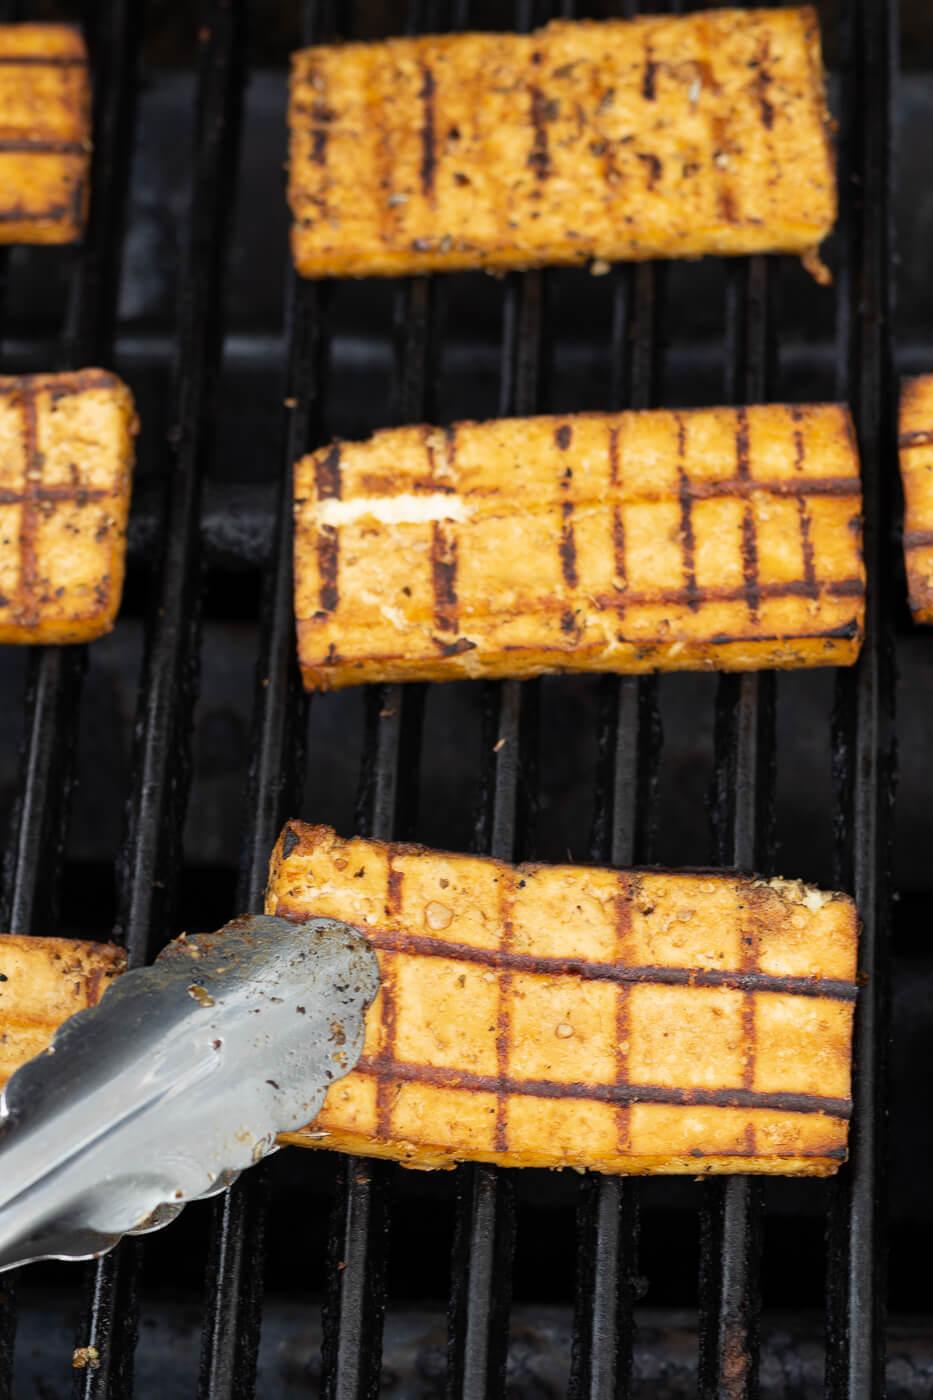 Tongs turn tofu steaks on a grill.